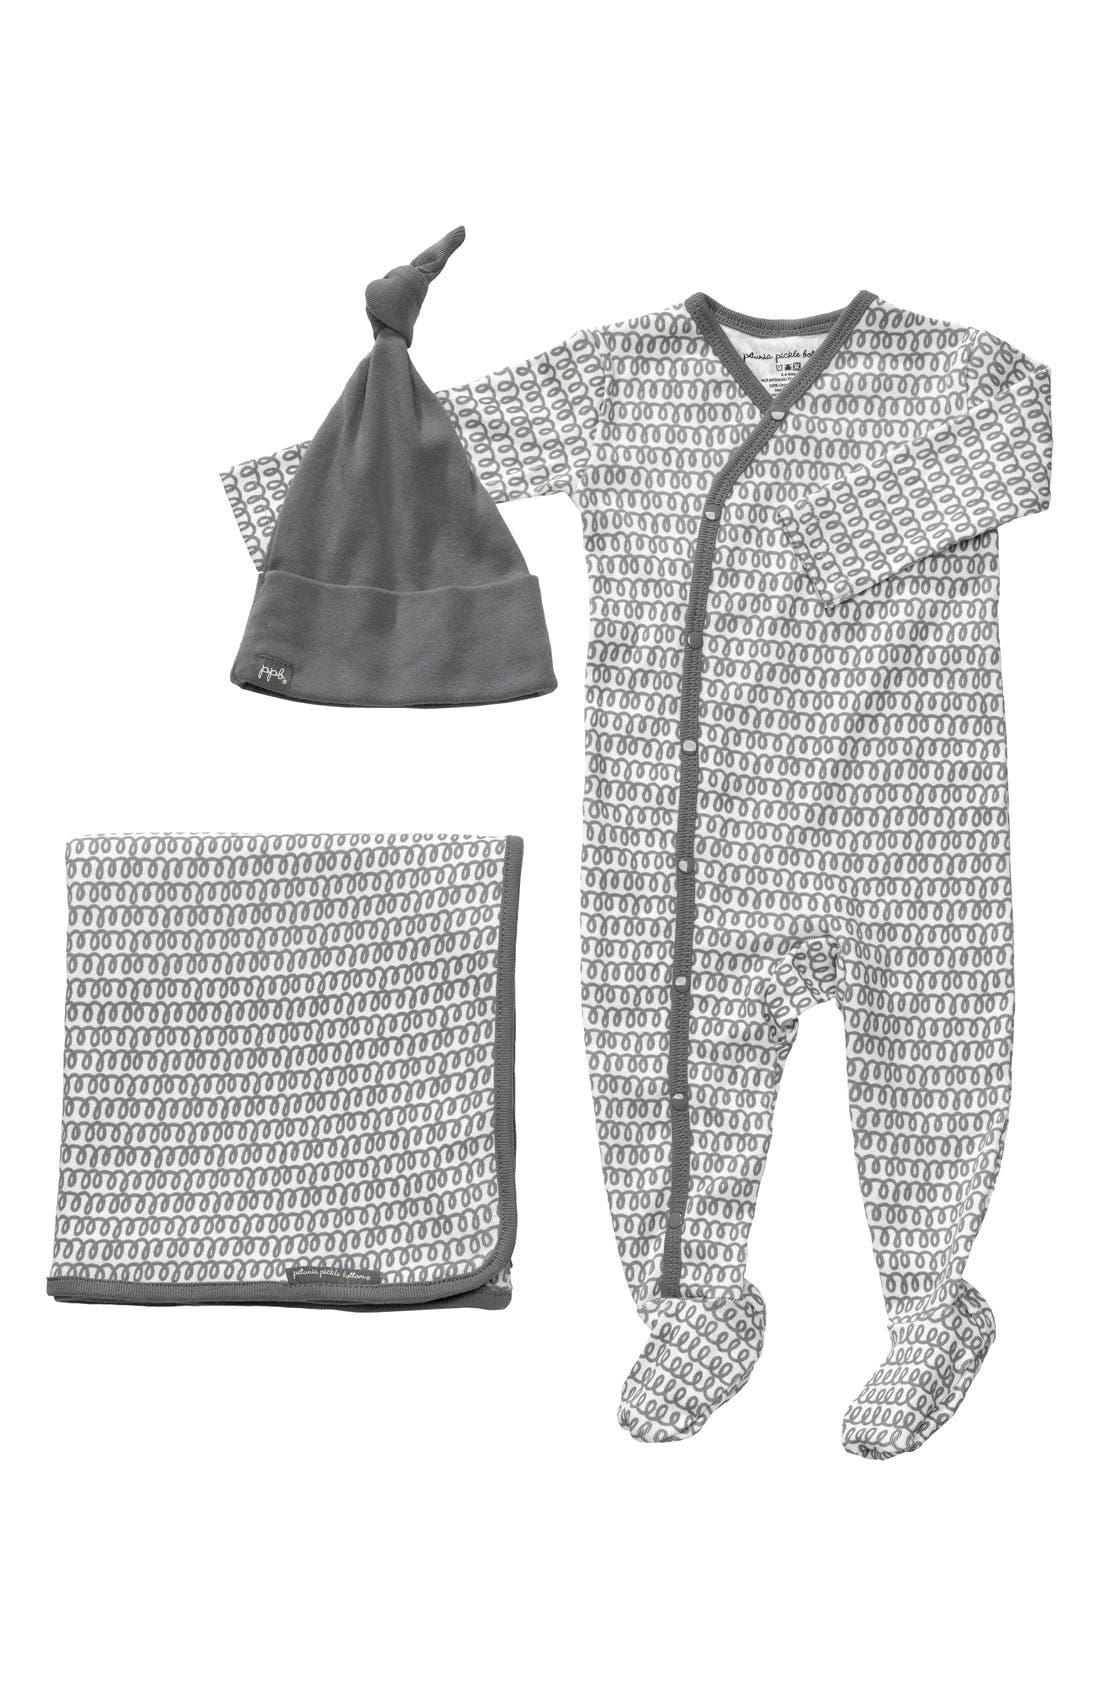 Main Image - Petunia Pickle Bottom 'Snuggle' Footie, Blanket & Hat Set (Baby)